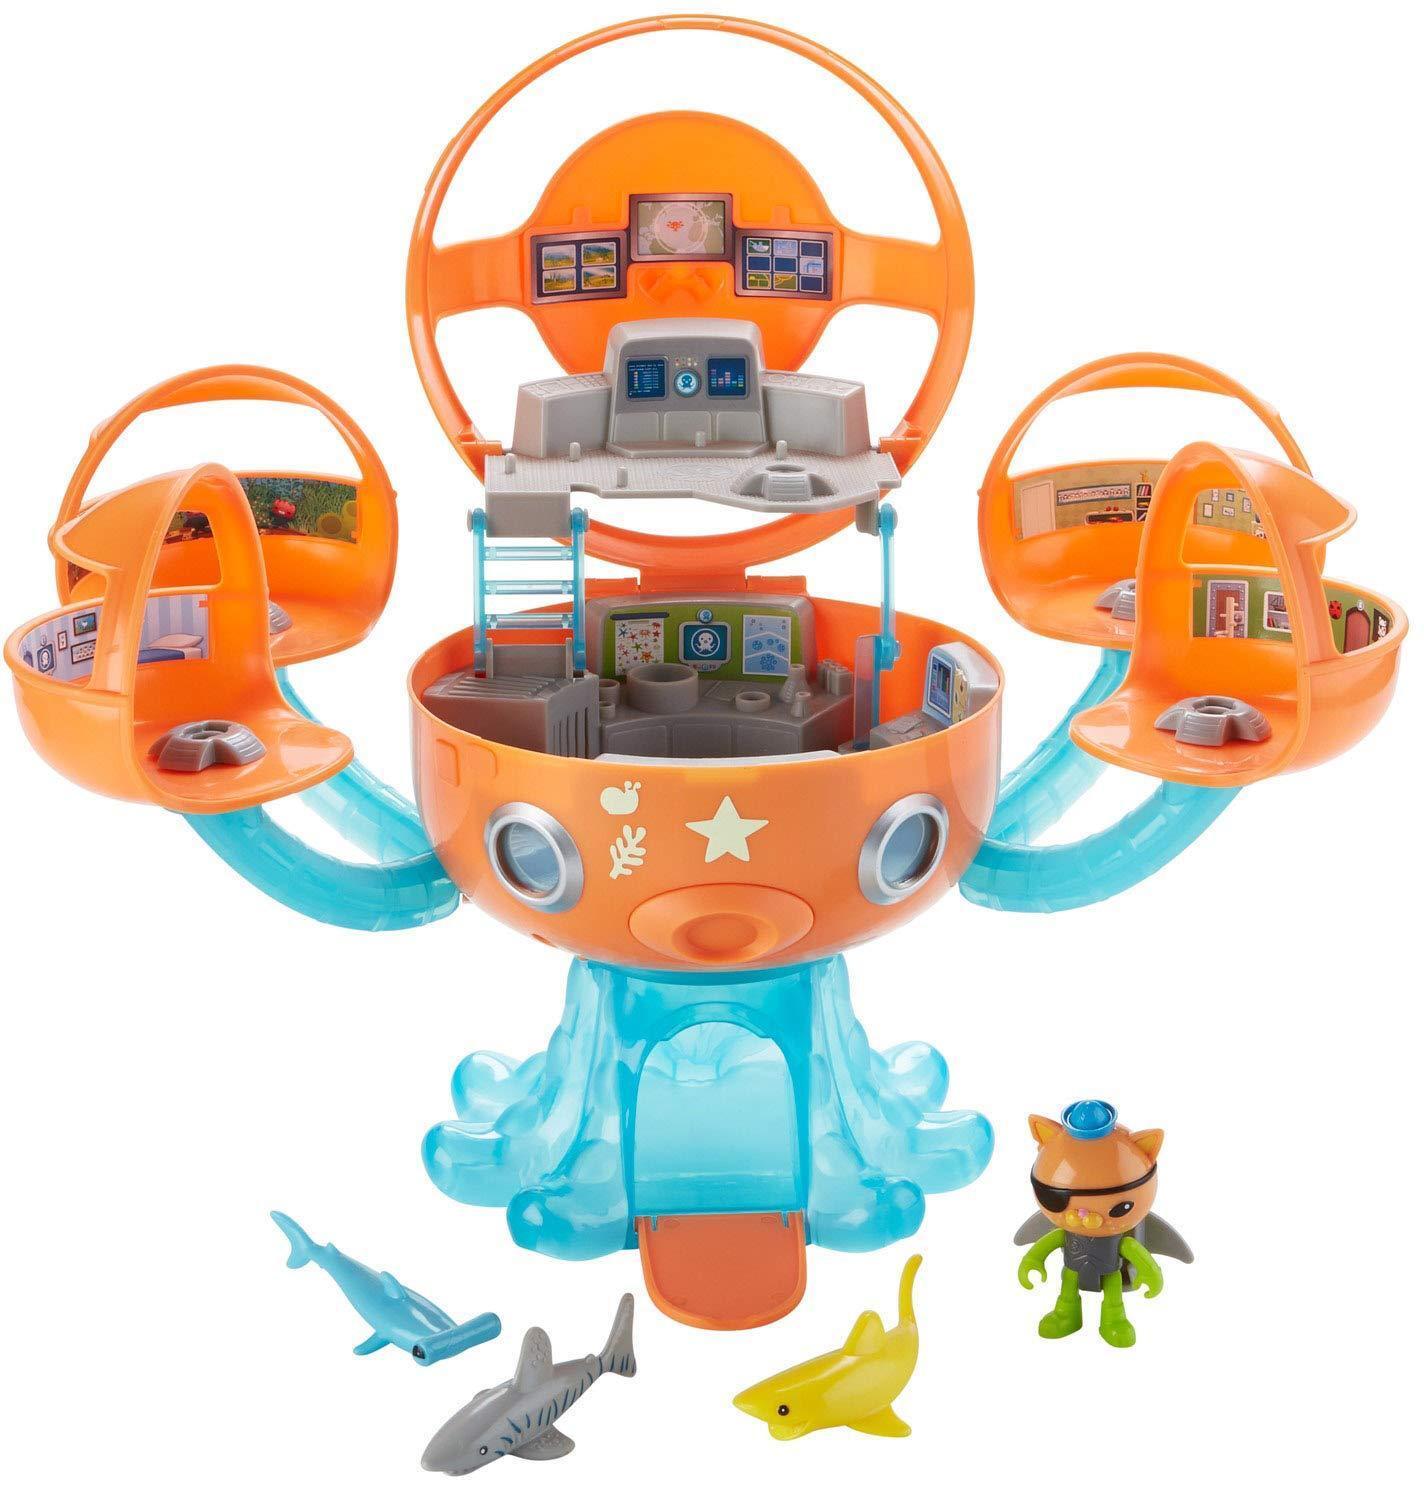 Octonauts Octopod Shark Adventure Playset ready wearing his jet pack